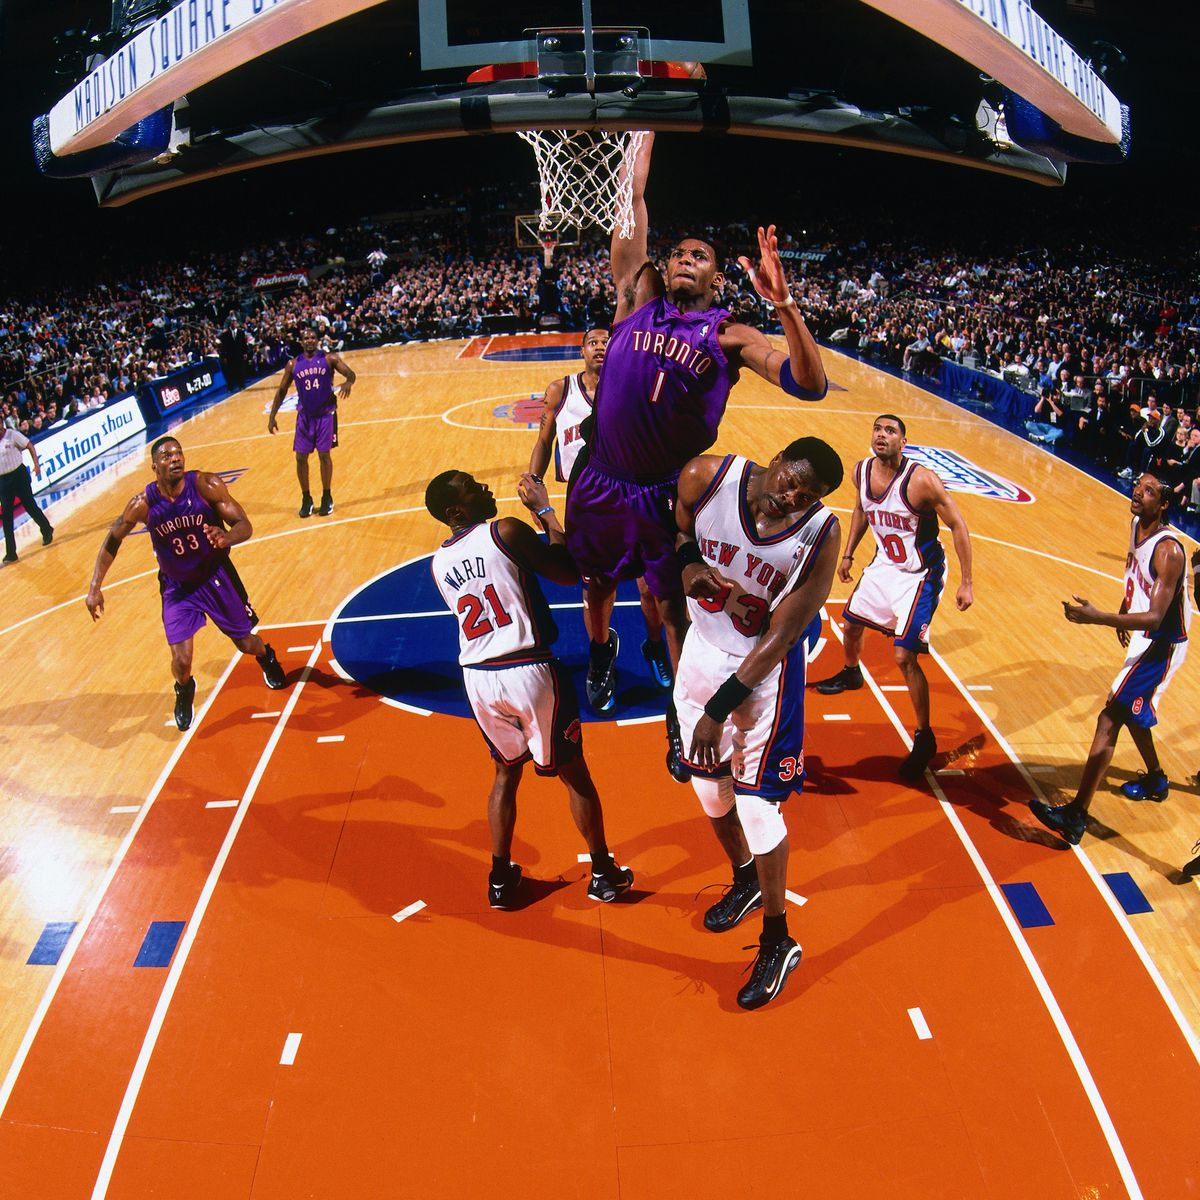 2000 Eastern Conference Quarterfinals, Game 2: Toronto Raptors vs. New York Knicks